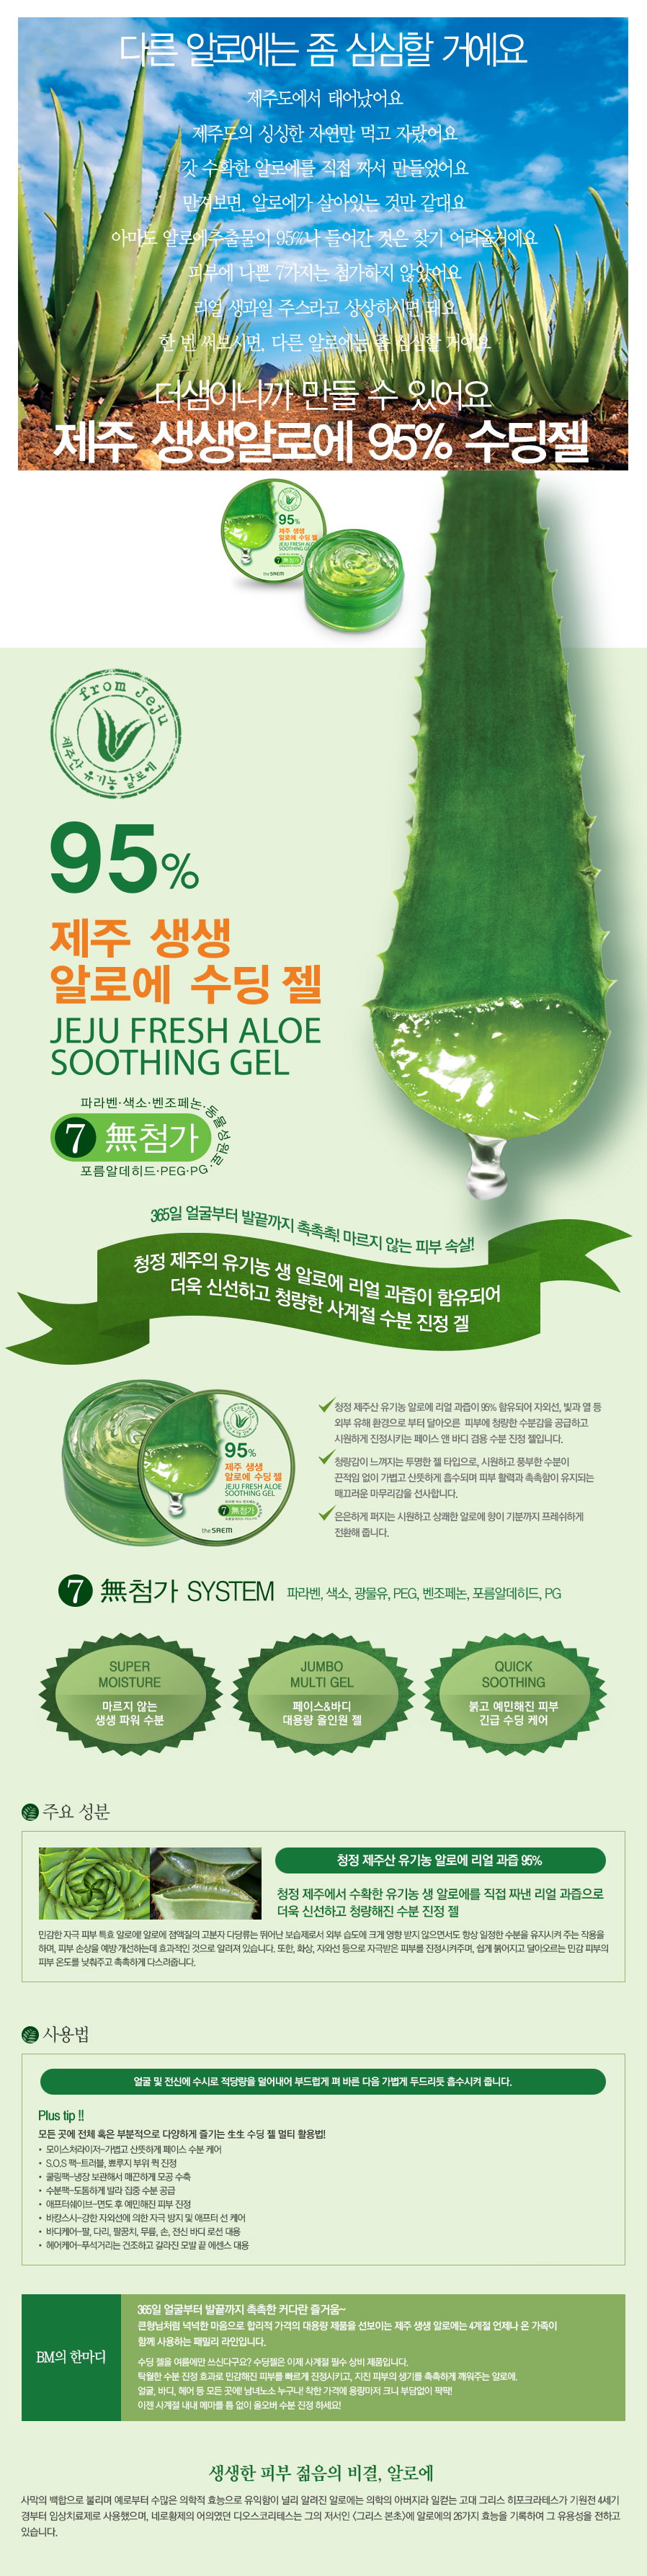 The Saem Jeju Fresh Aloe Soothing Gel 95 Cutest Makeup Shooting